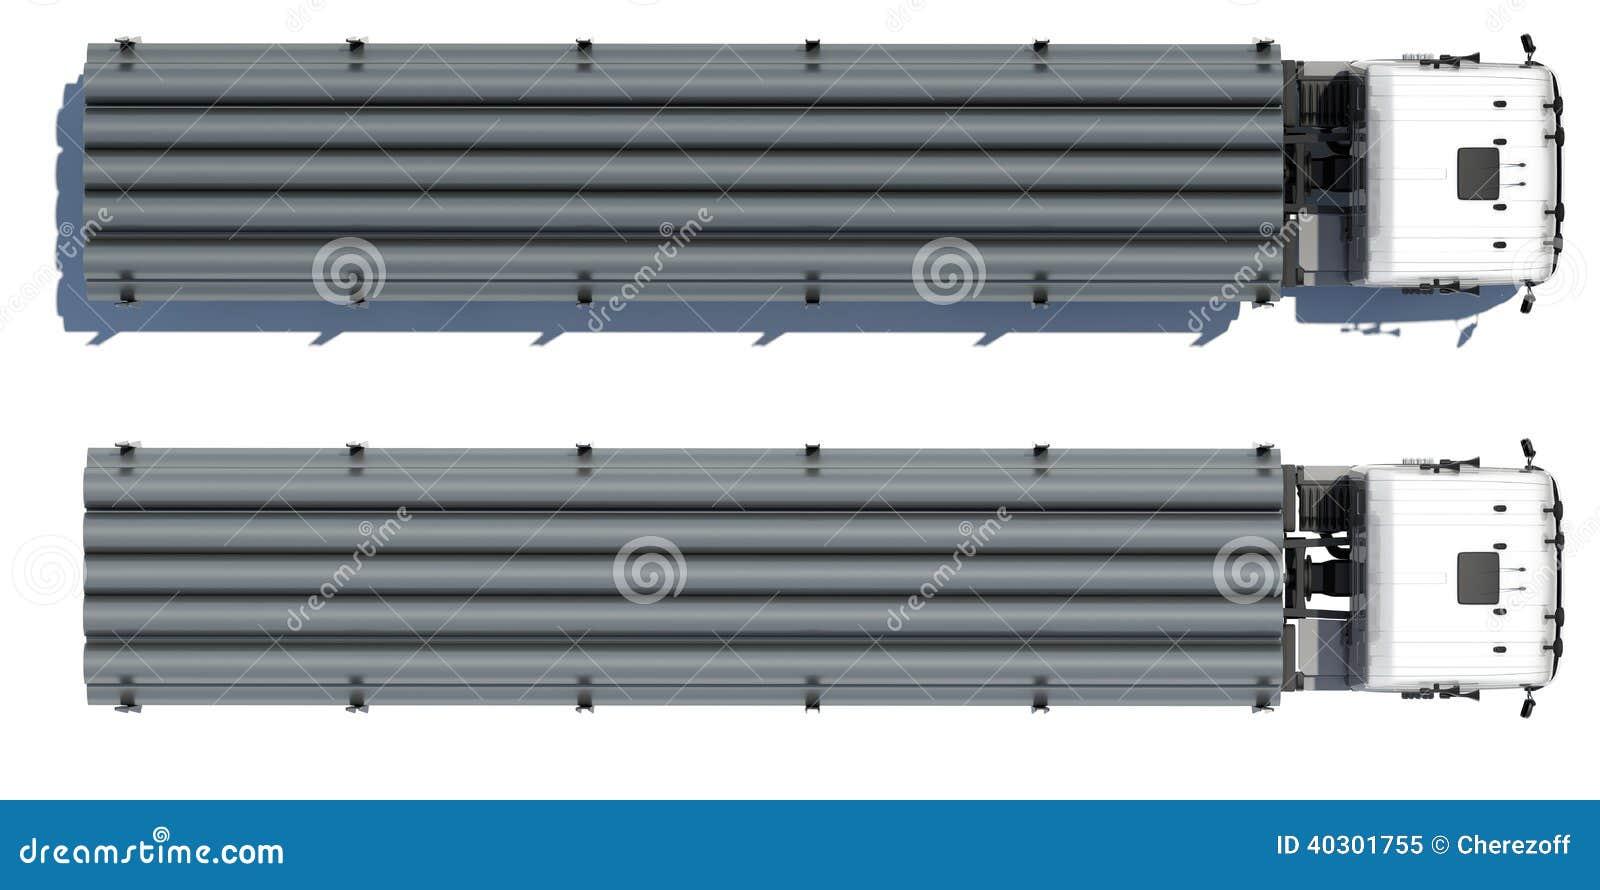 Truck transporting pipe stock illustration. Illustration of truck ...